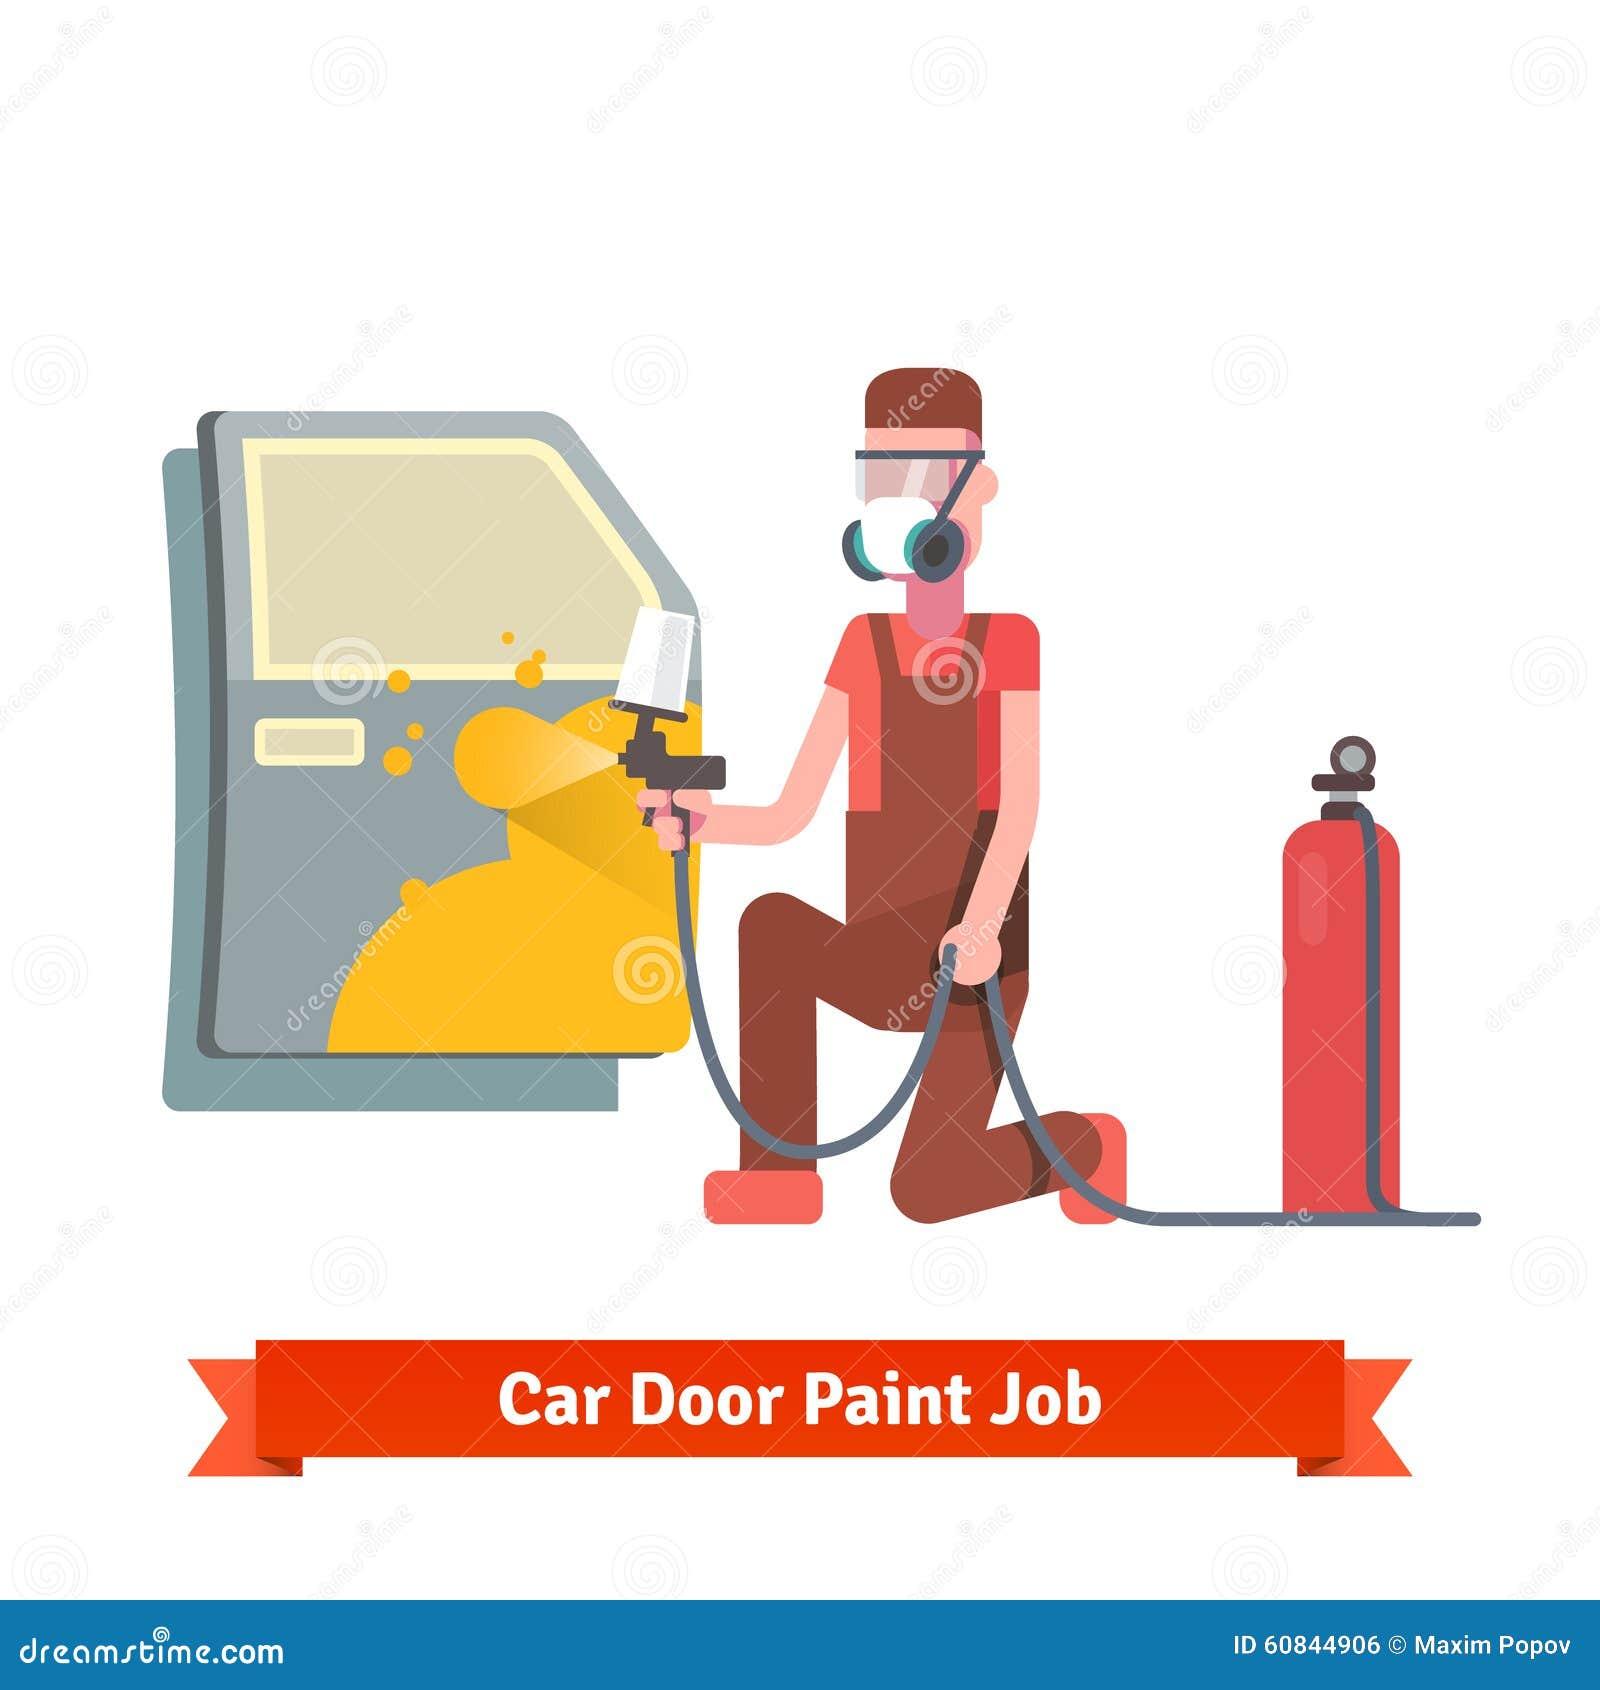 Cost Exterior Paint Job Painting Prices Professional: Car Door Paint Job Stock Vector